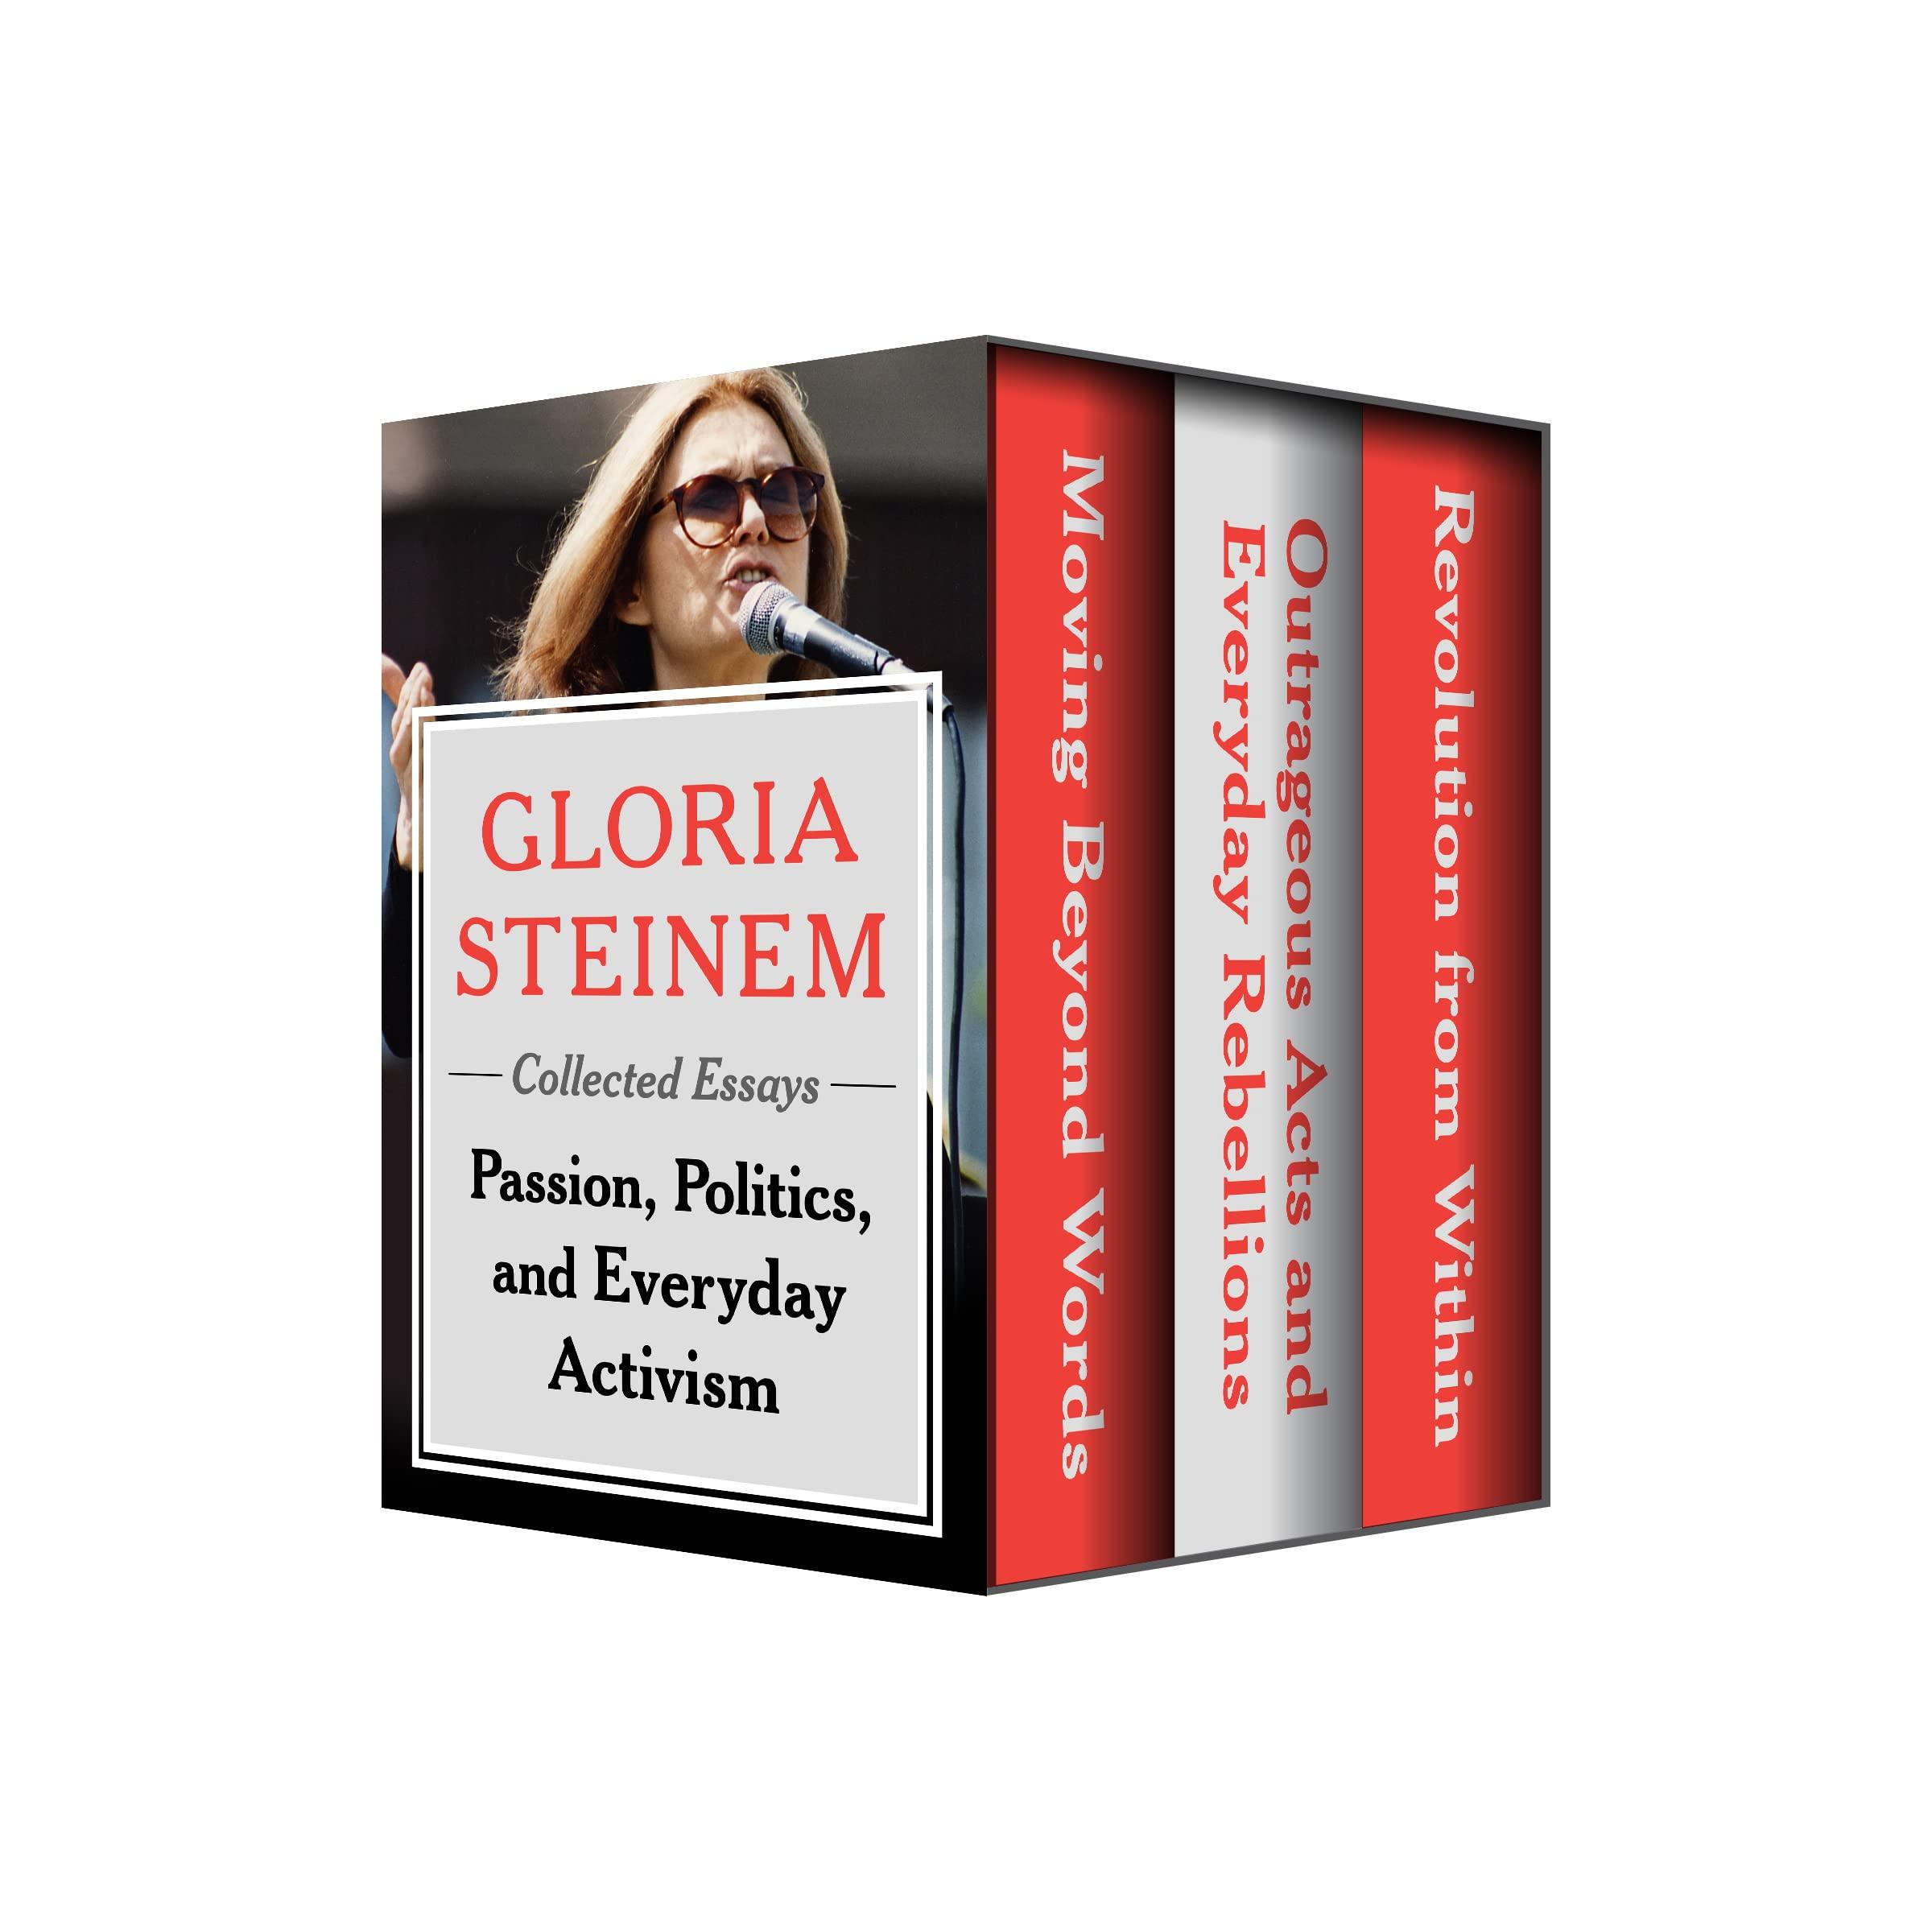 Passion, Politics, and Everyday Activism: Collected Essays Gloria Steinem